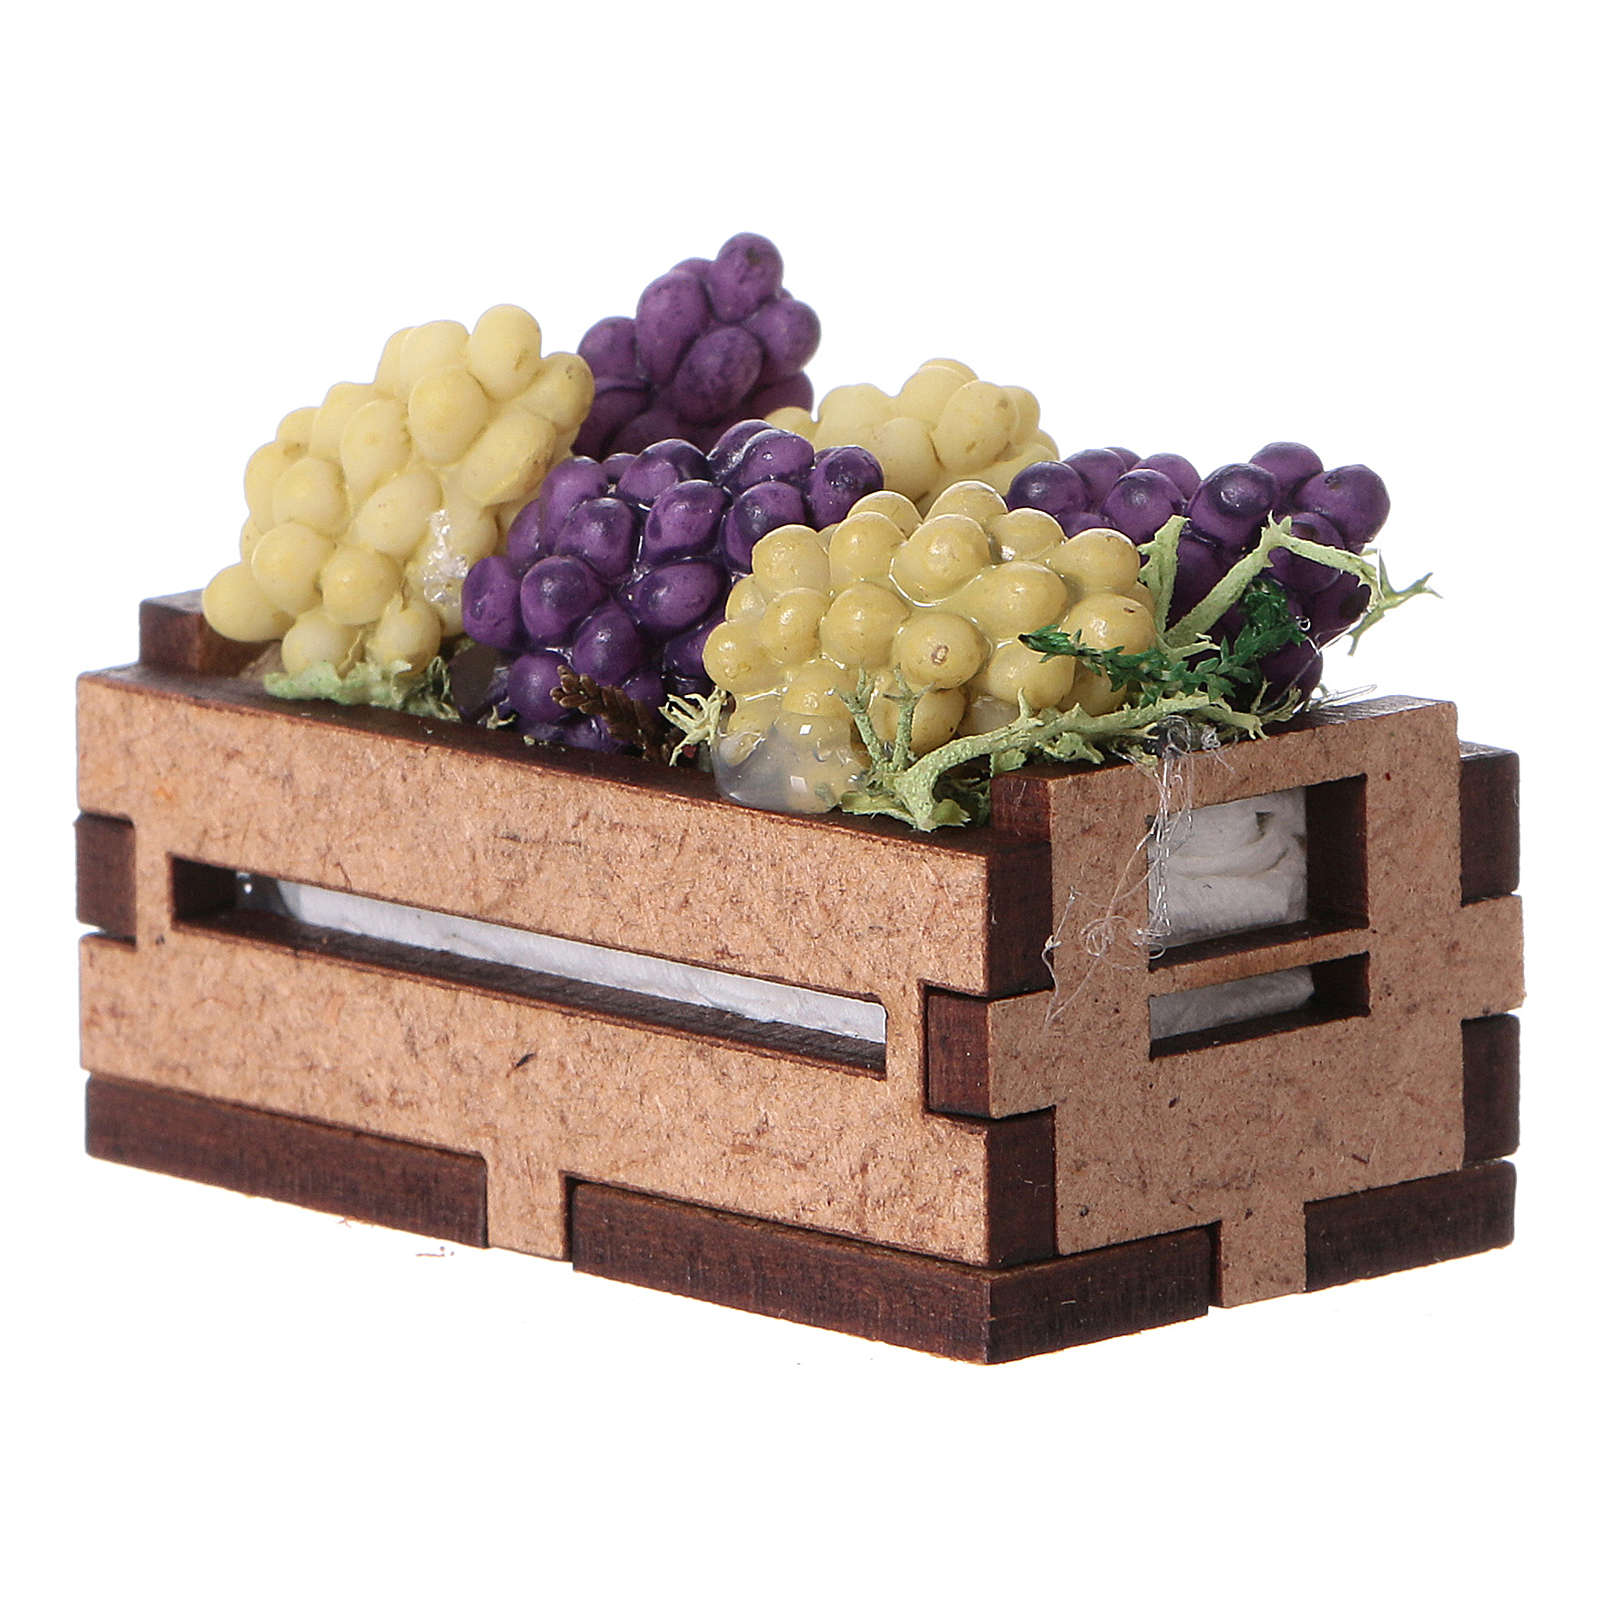 Caisse de raisin 5x5x5 cm 4